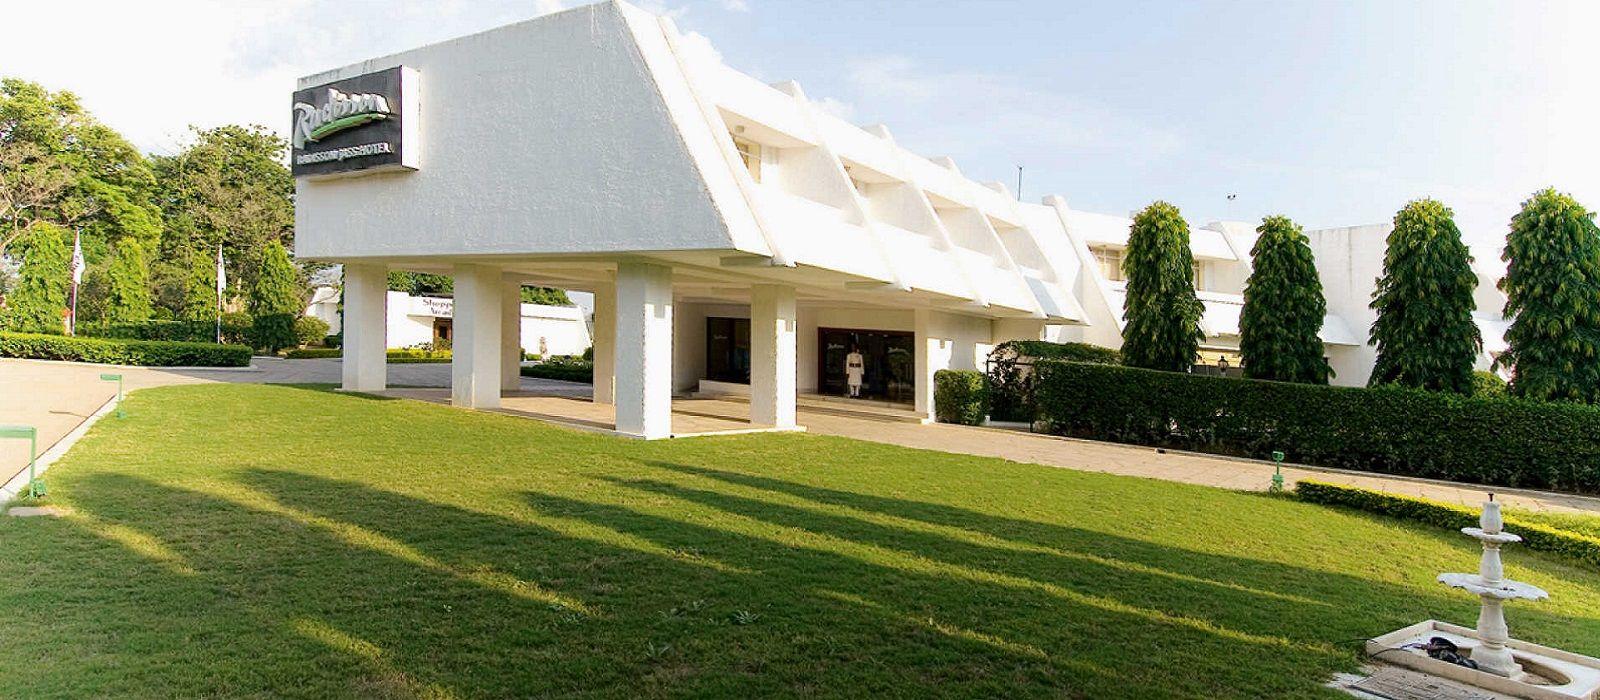 Hotel Radisson  Khajuraho North India